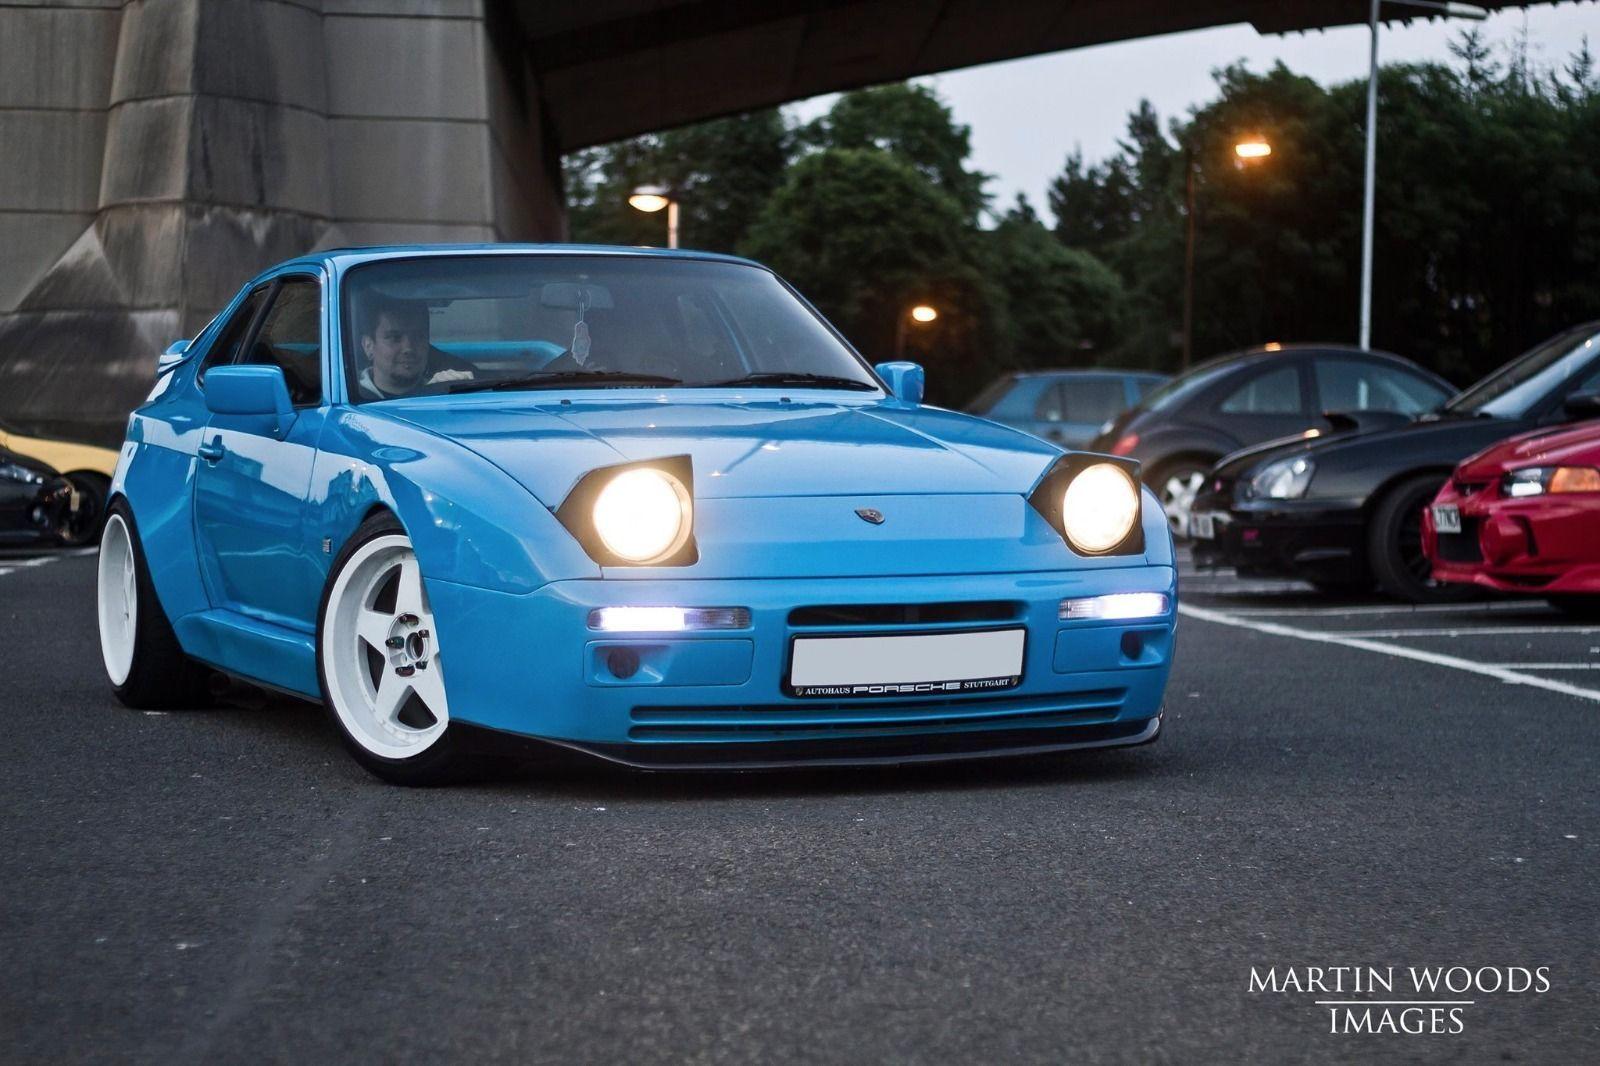 Porsche 944 S2 Riviera Blue Wide Body Modified 228 Bhp Japanese Styling Jdm Porsche 944 Vintage Porsche Porsche Replica